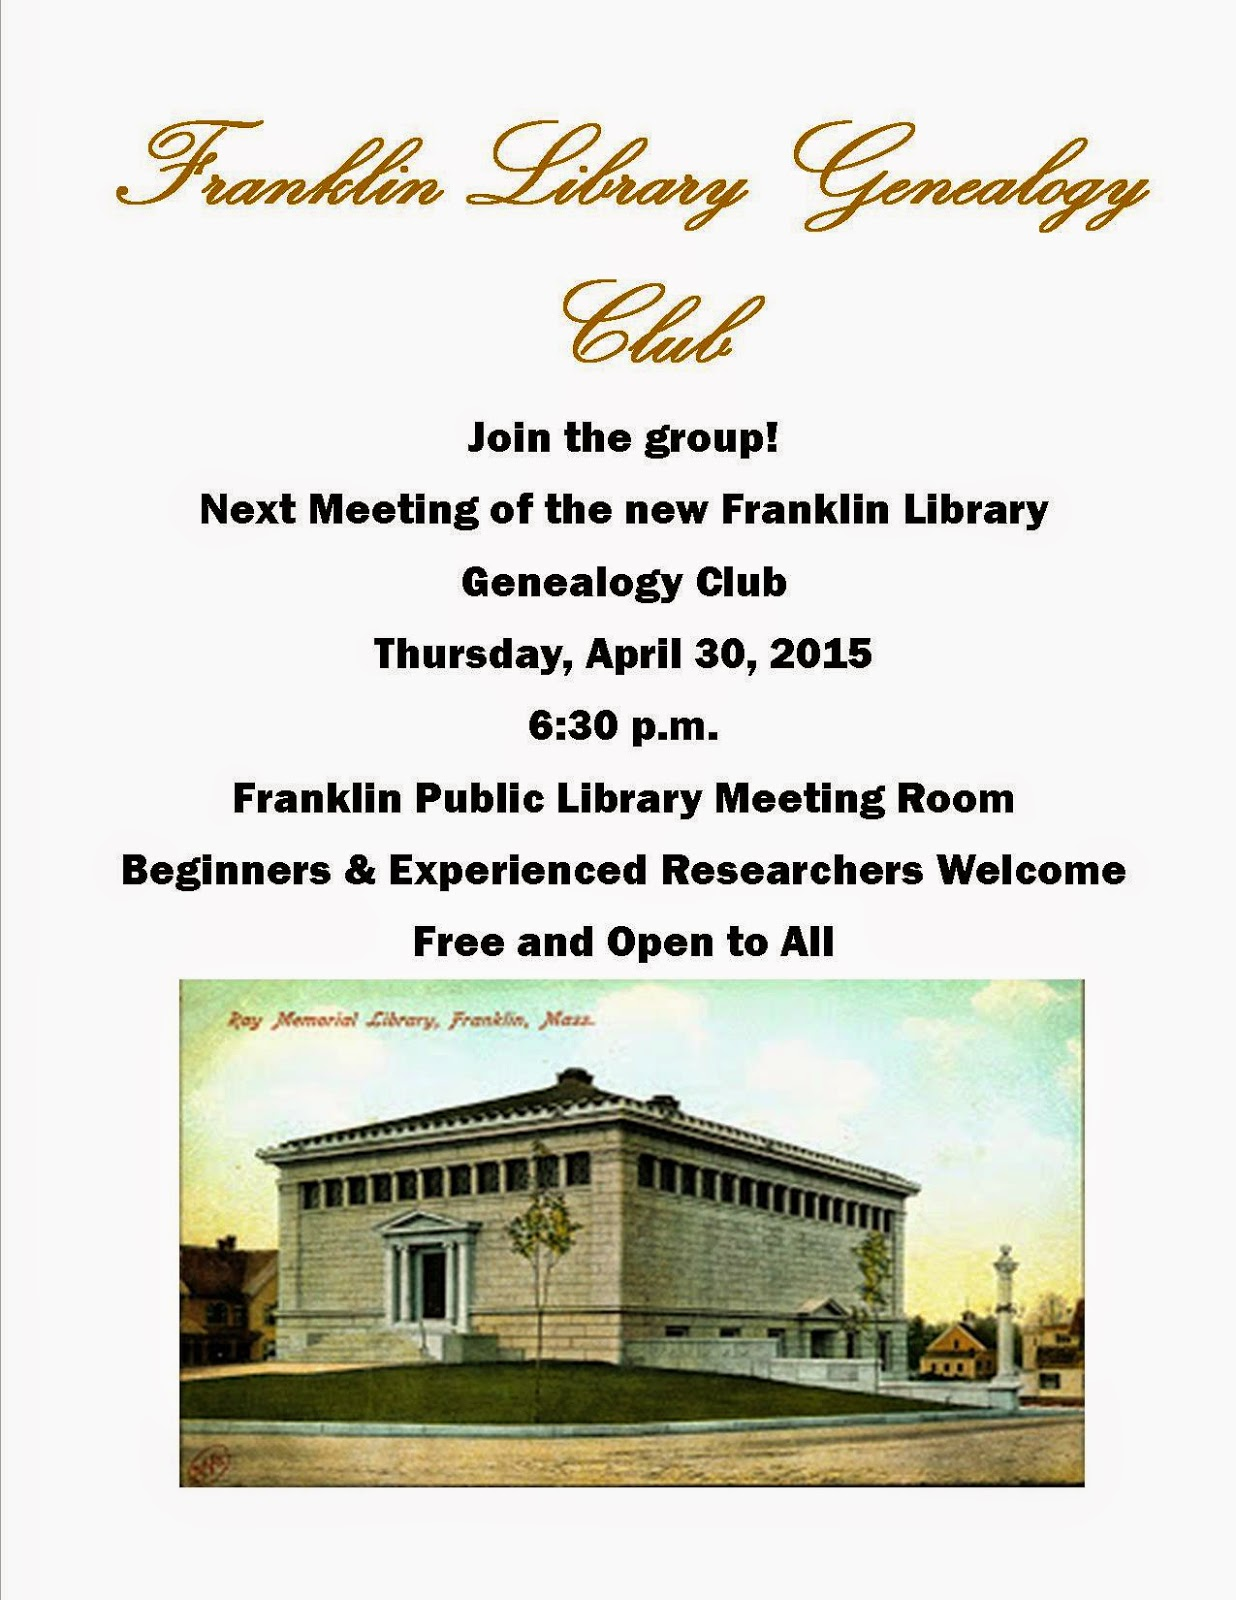 genealogy club - Apr 30